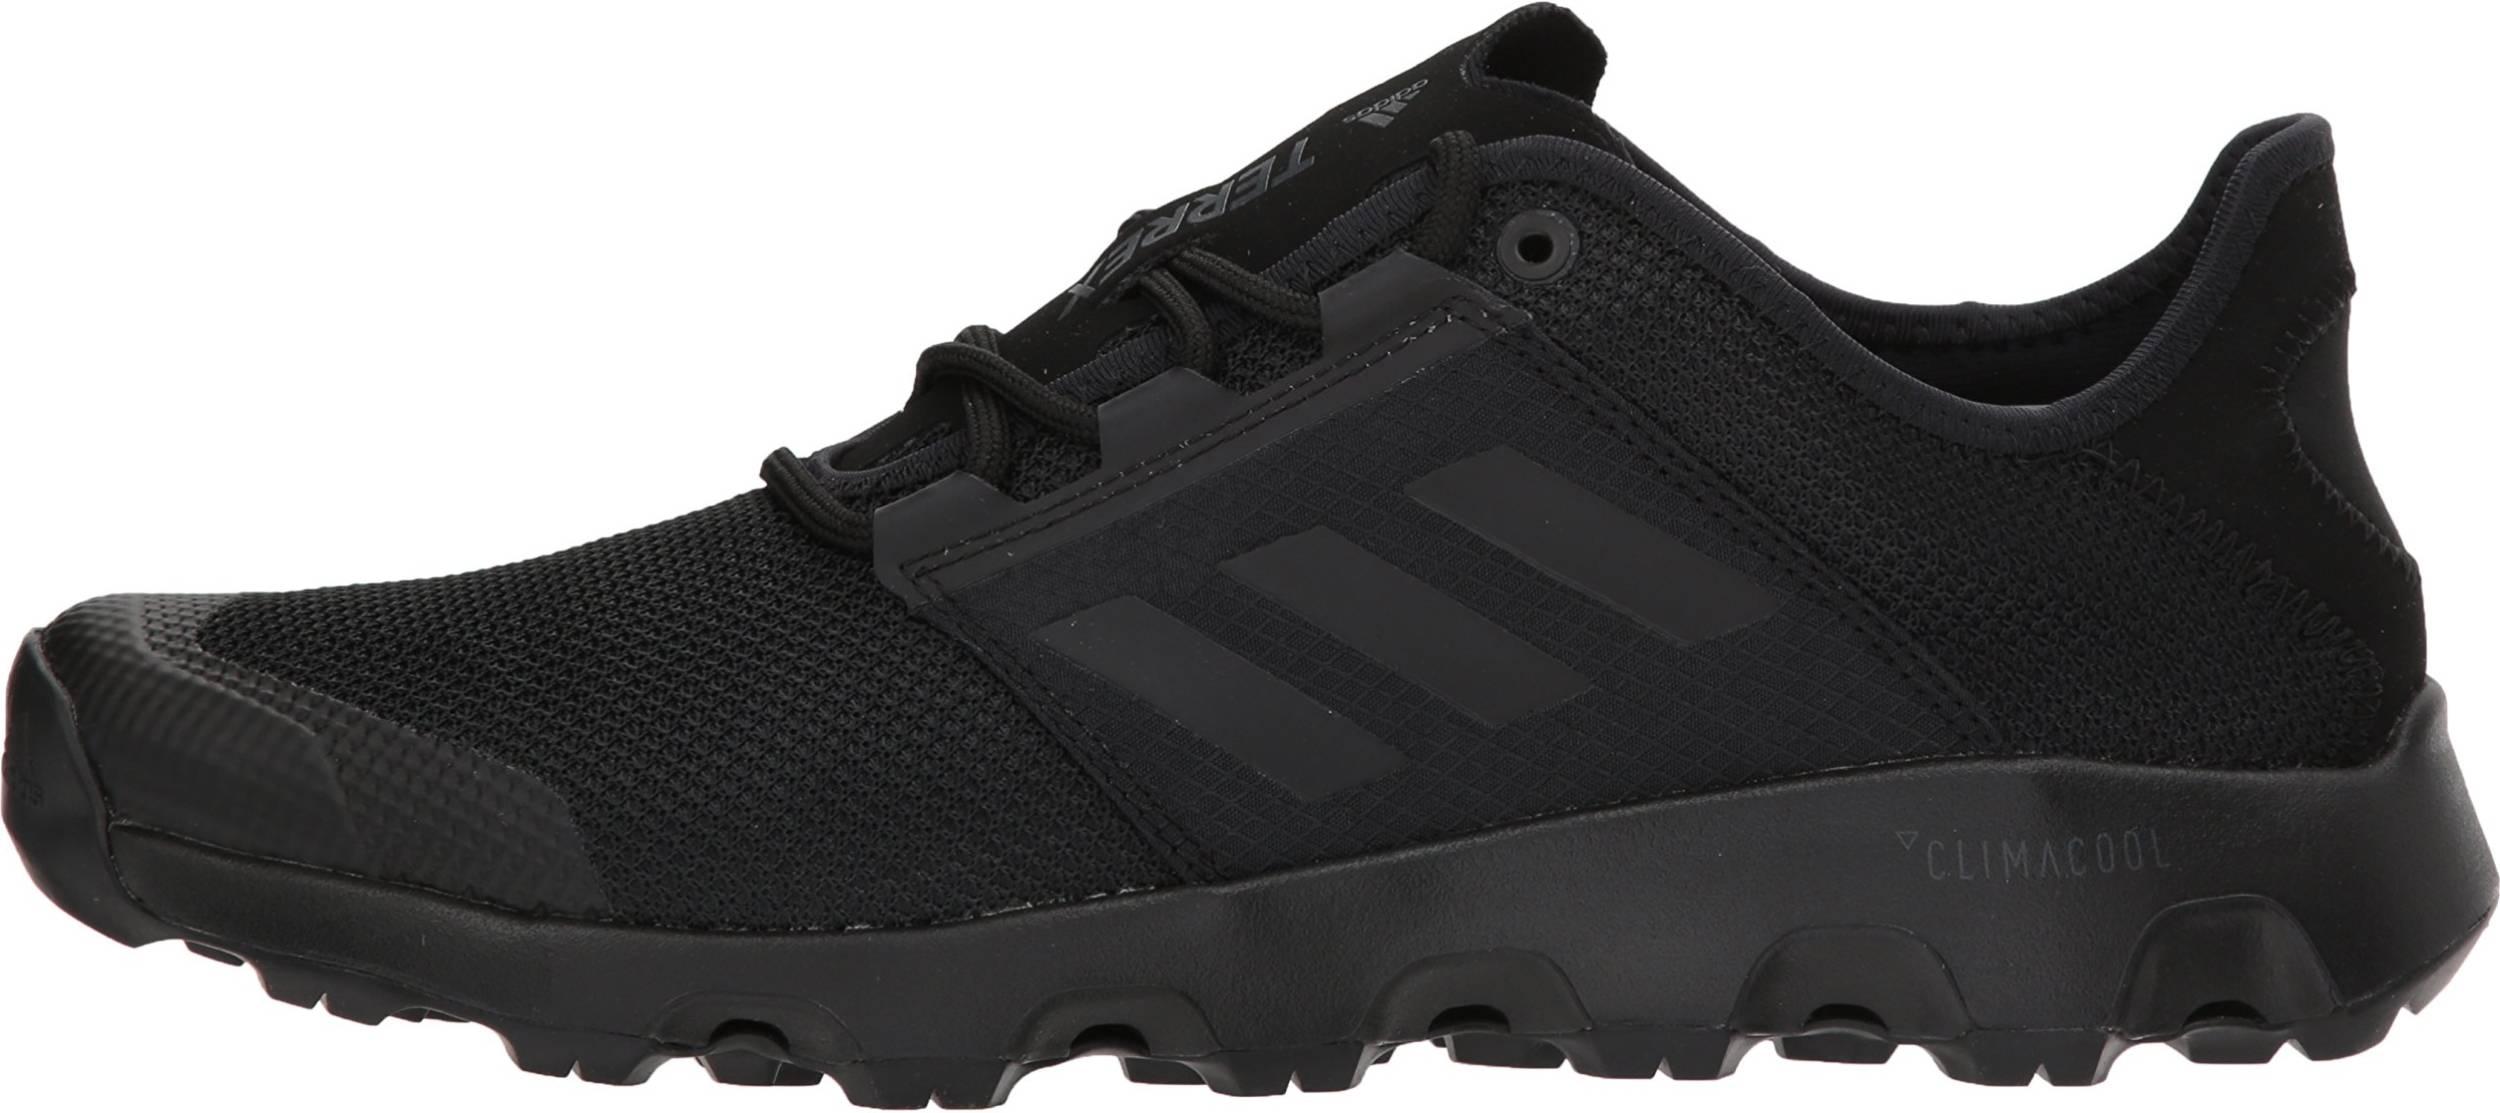 Adidas Terrex Voyager